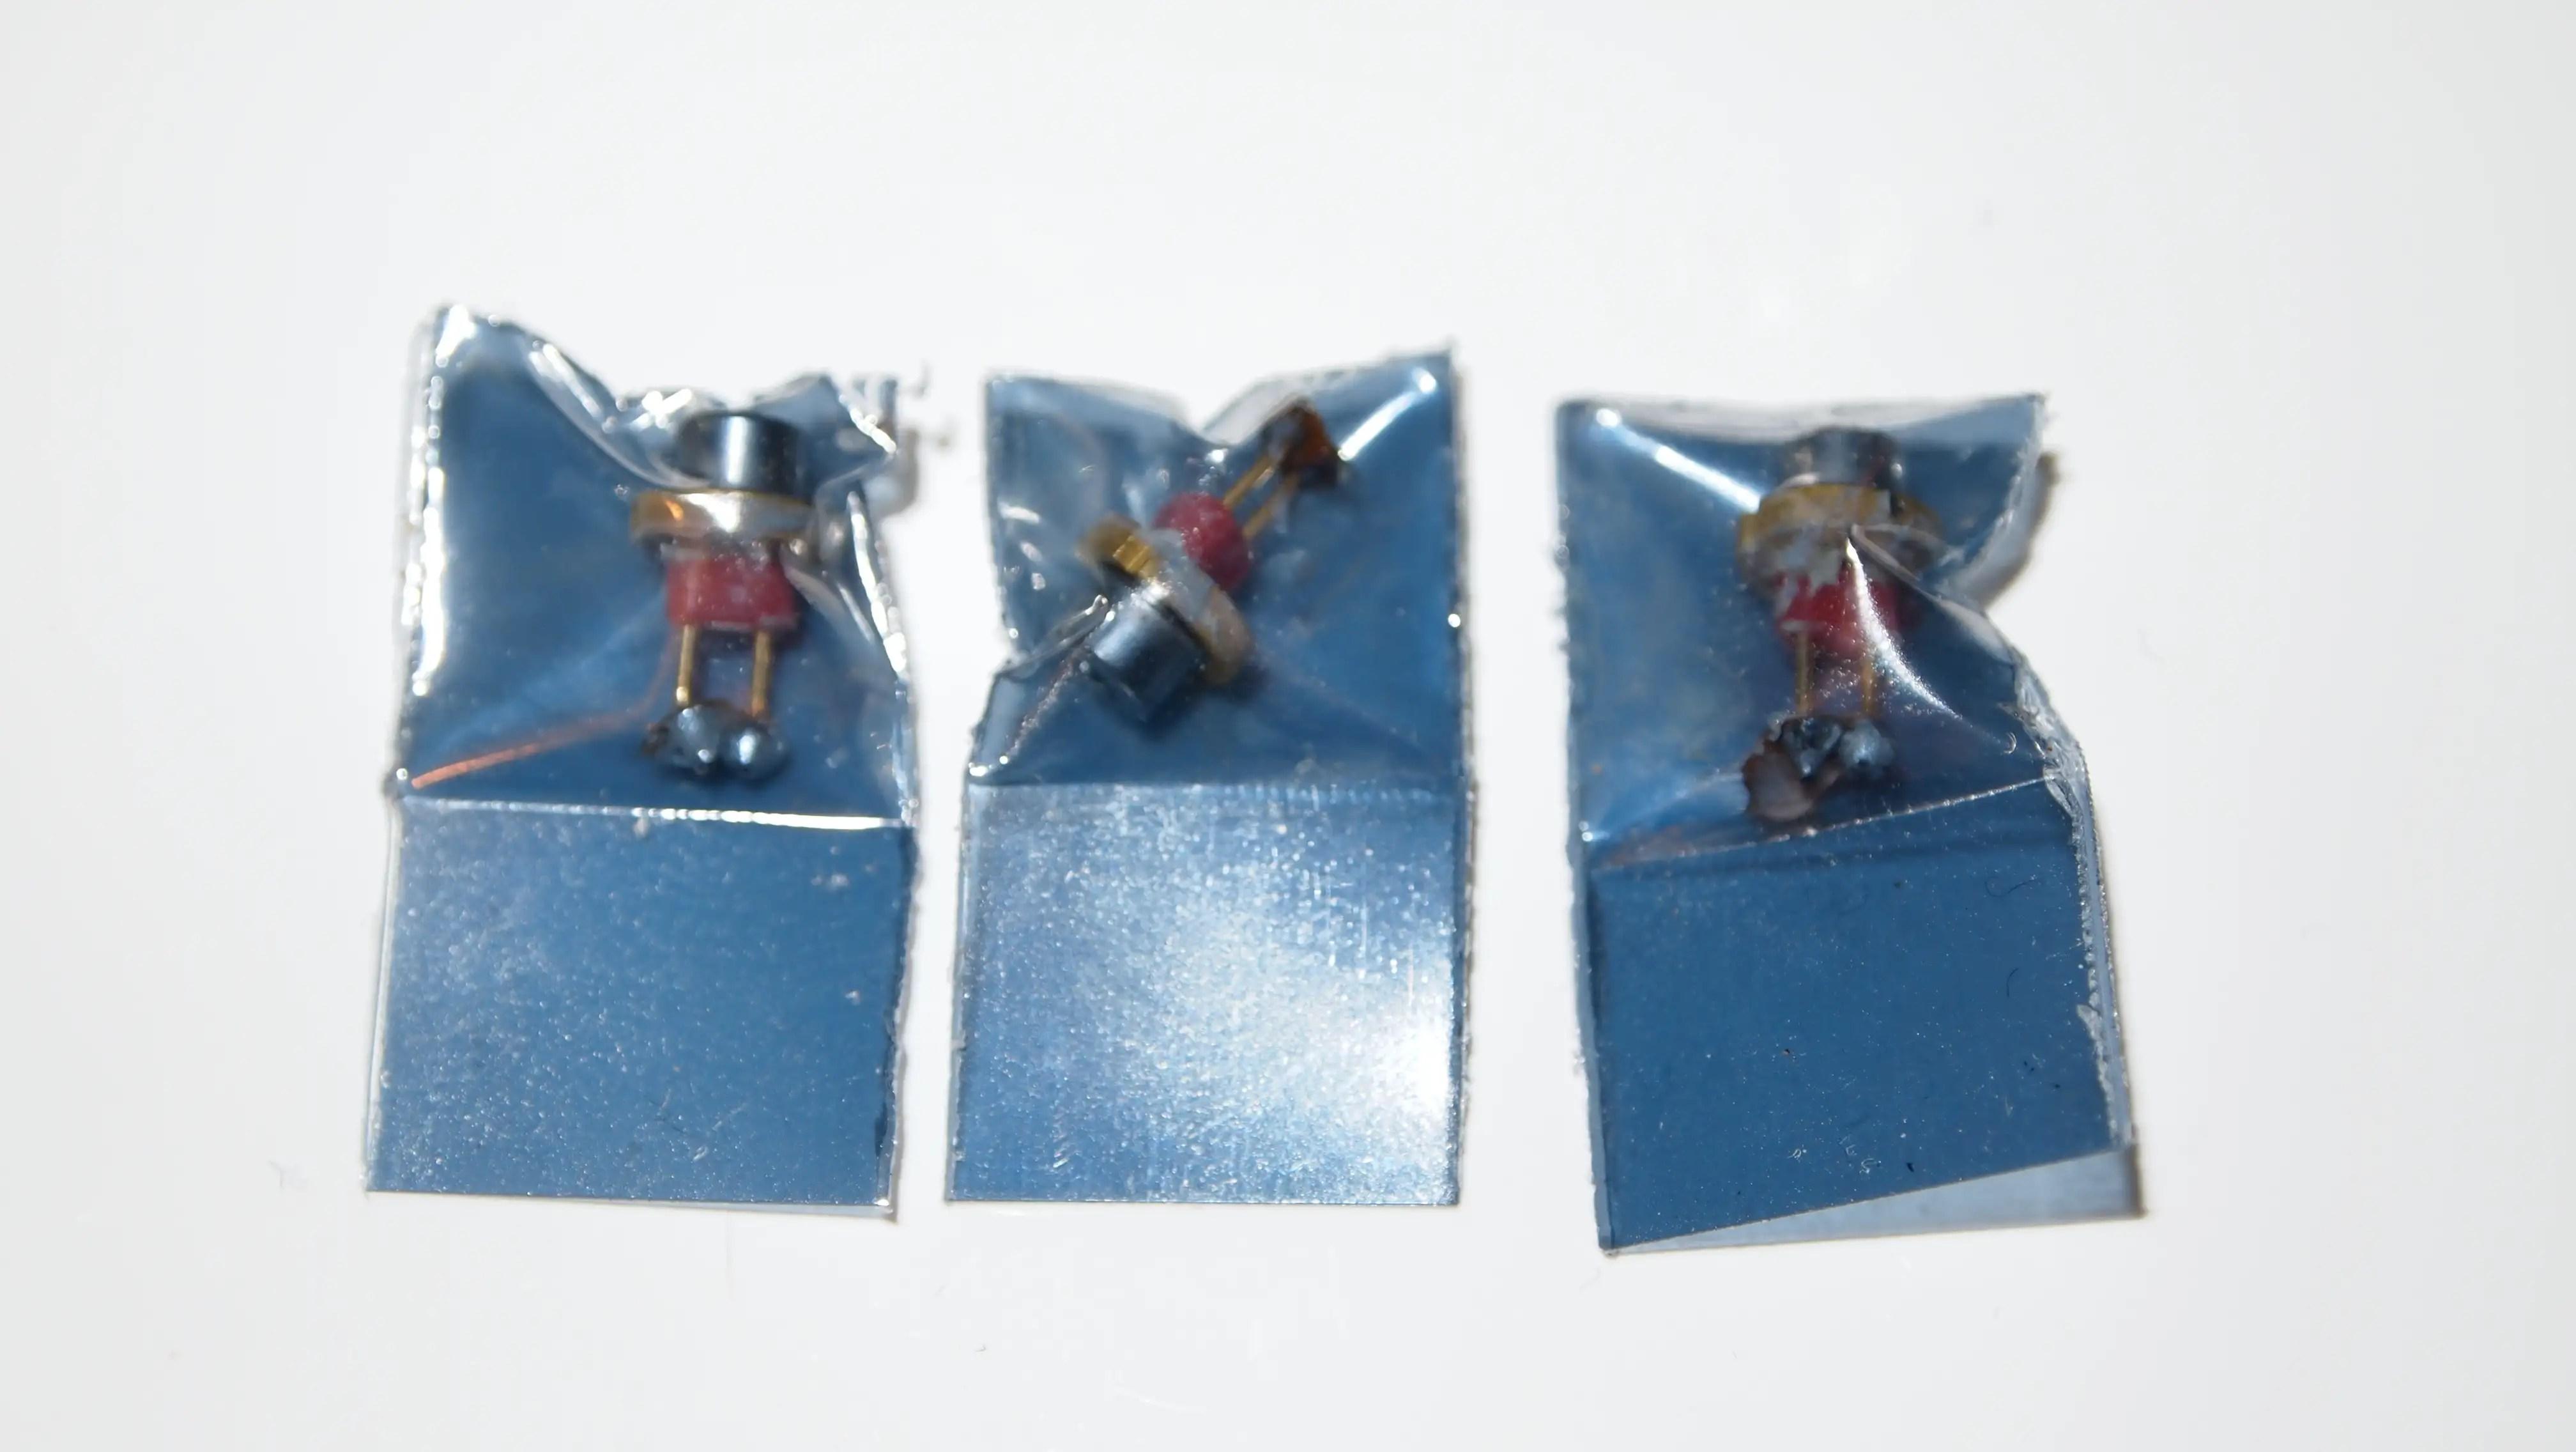 1w blue laser diagram printable teeth 445nm module w flexdrive and aixiz glass ebay